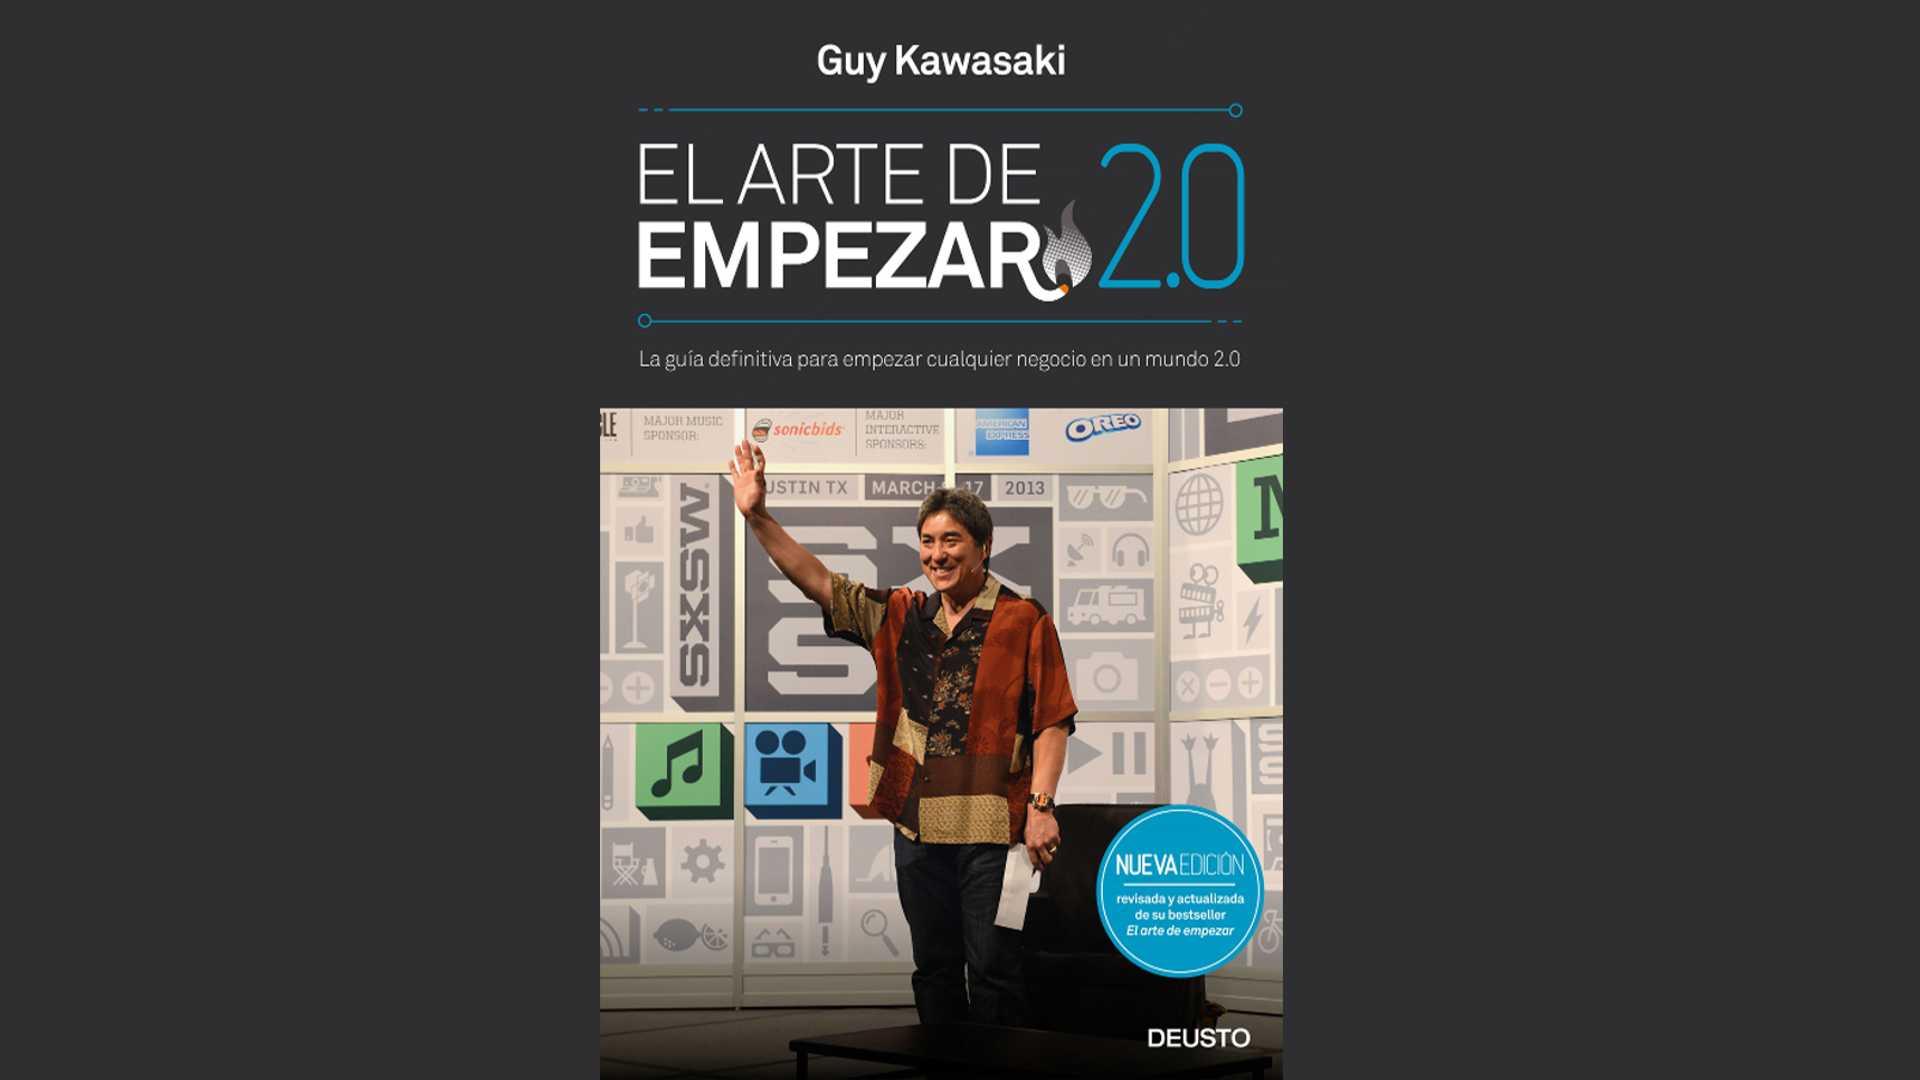 El-arte-de-empezar-guy-kawasaky